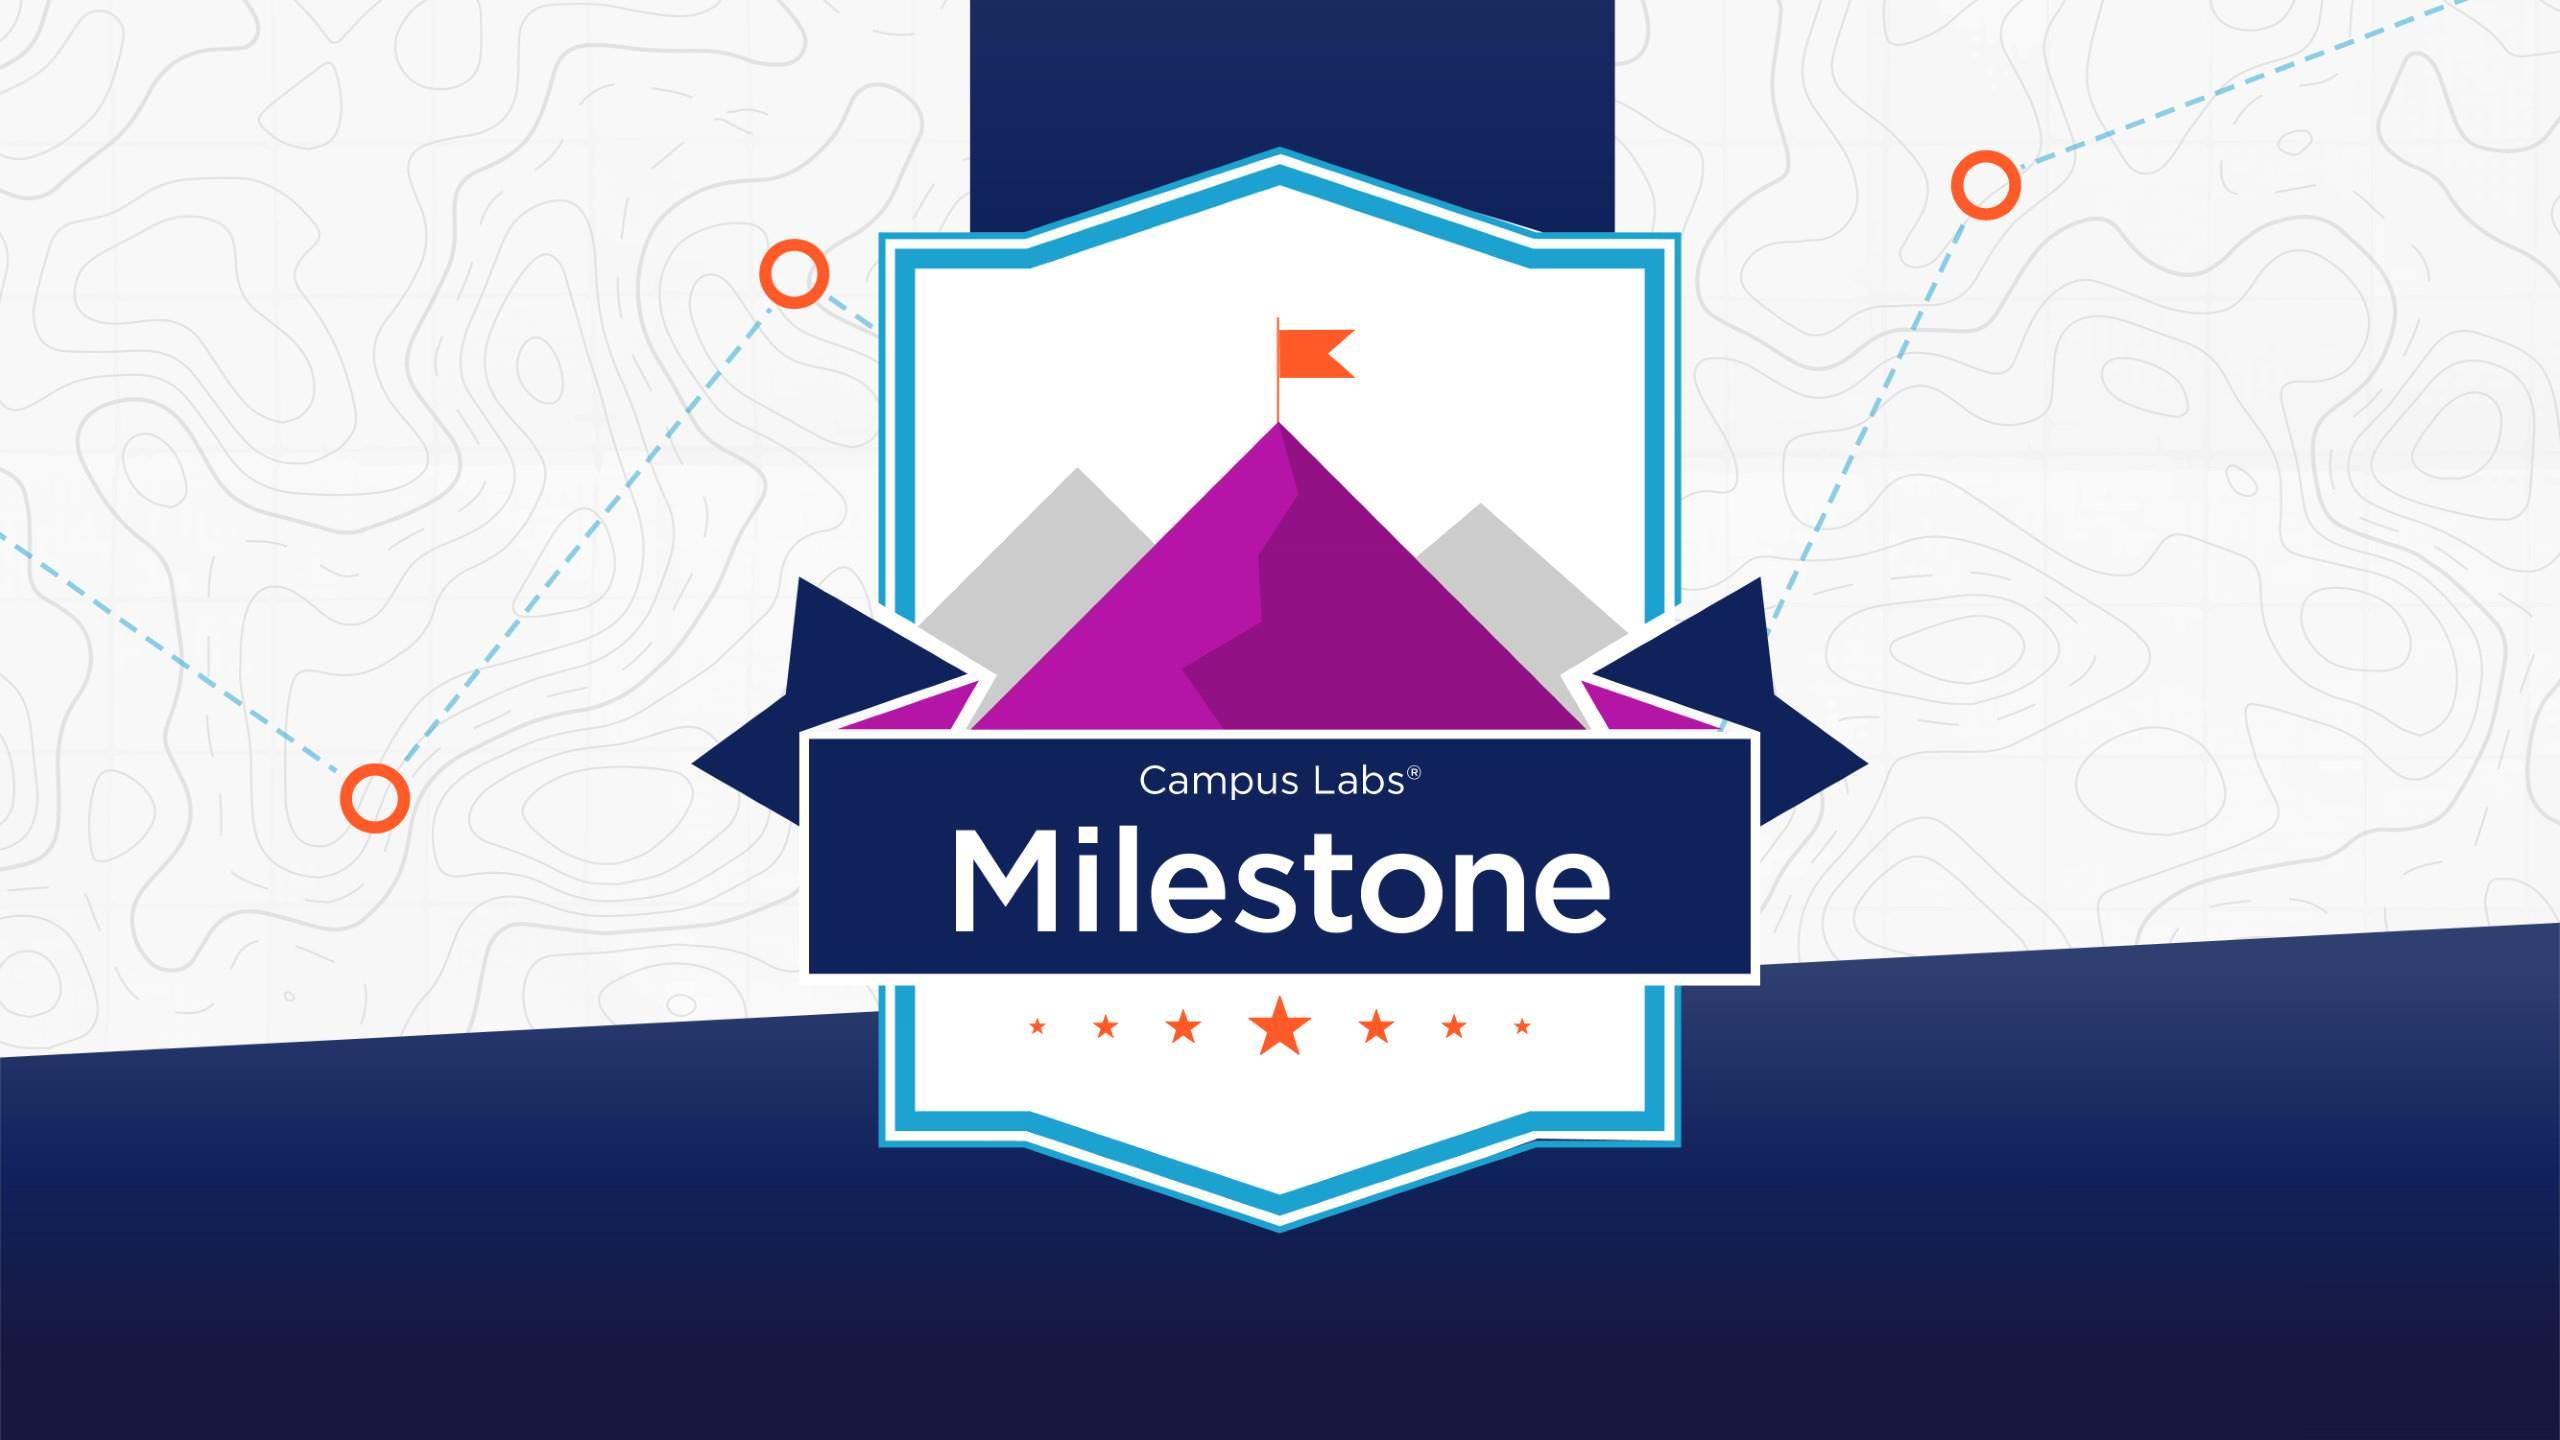 CL Milestone